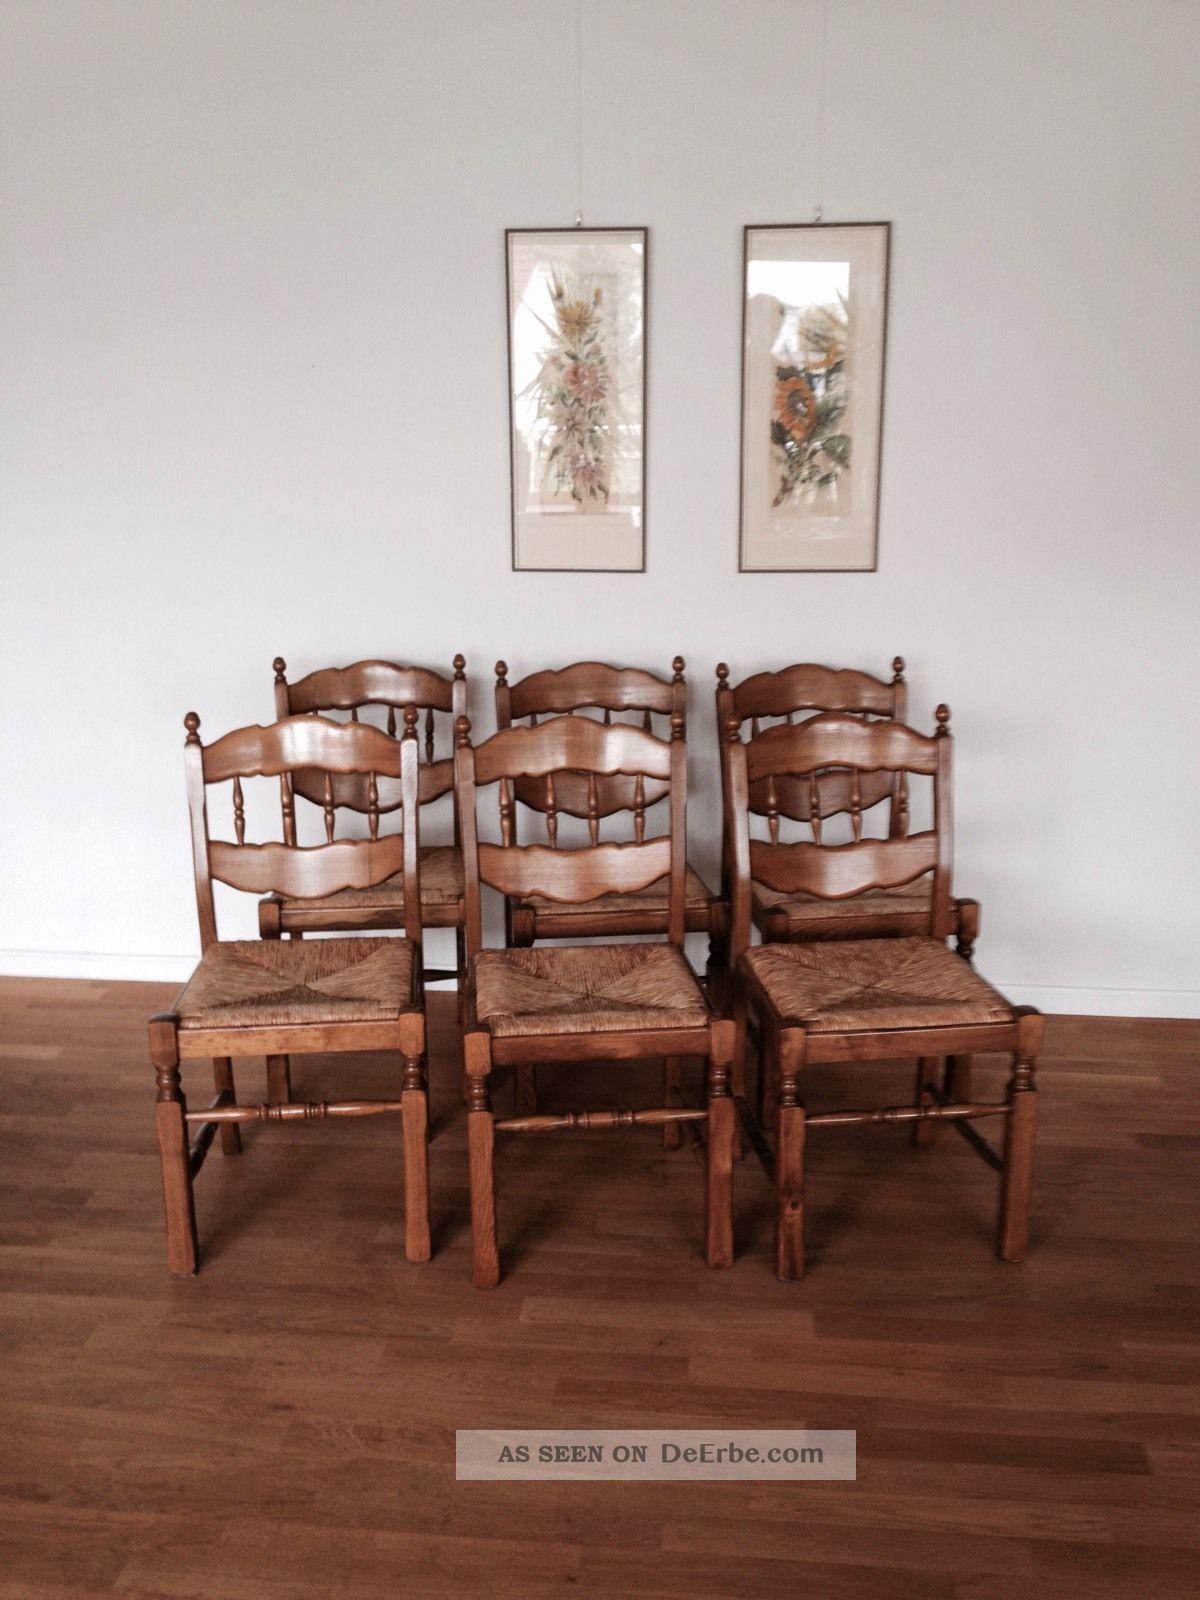 6 st hle eiche massiv sitz rattangeflecht 80er sehr gut erhalten stabil. Black Bedroom Furniture Sets. Home Design Ideas